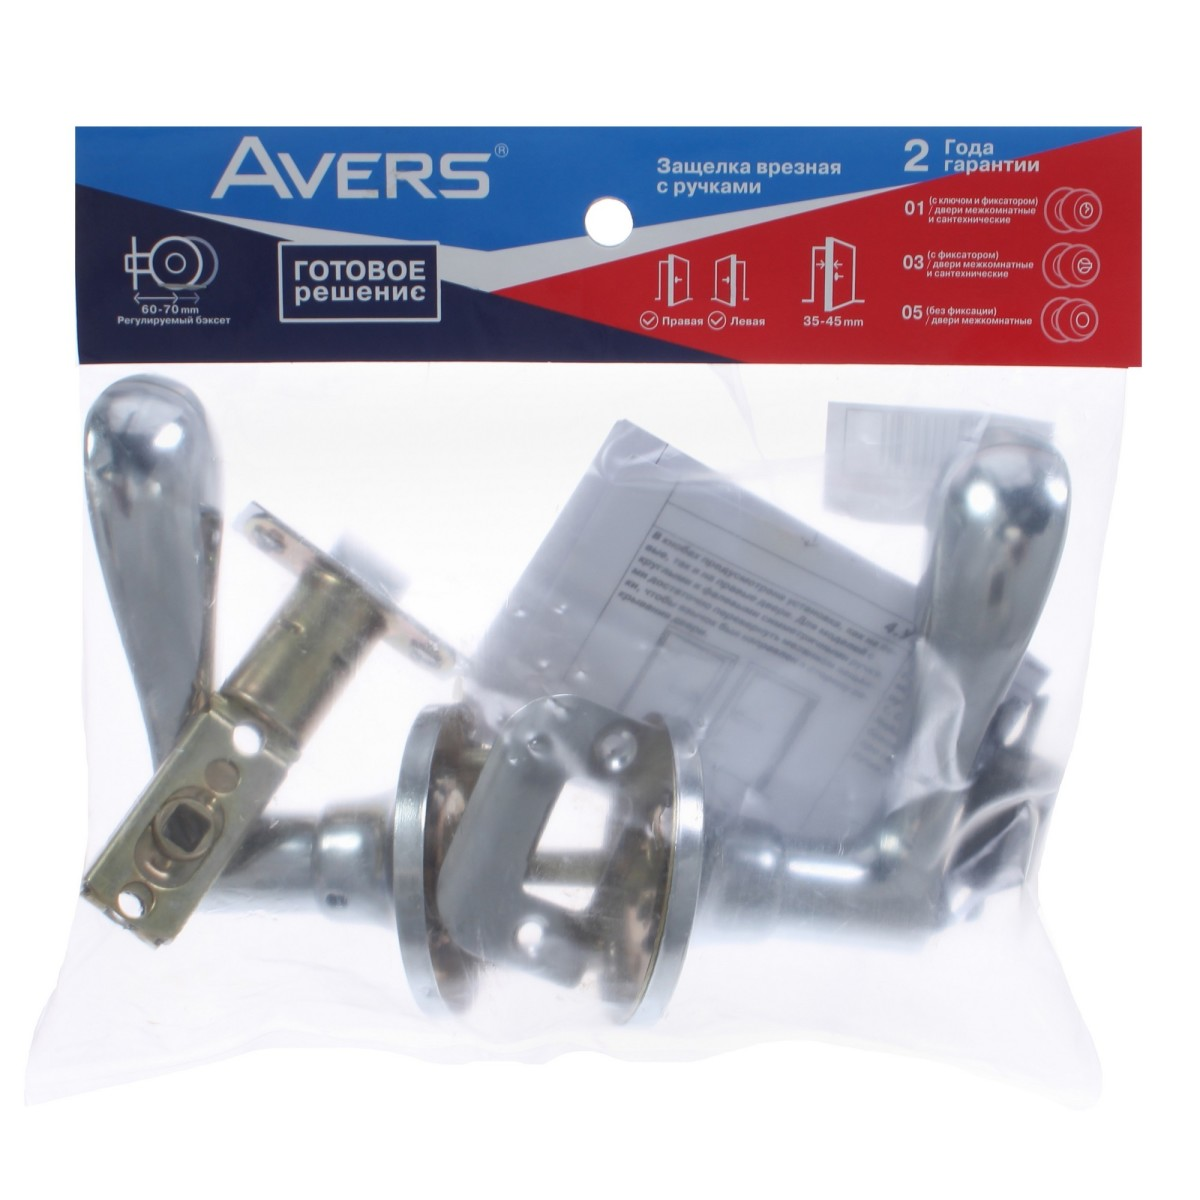 Ручка-Защёлка Avers 8091-05-Cr Без Запирания Сталь Цвет Хром